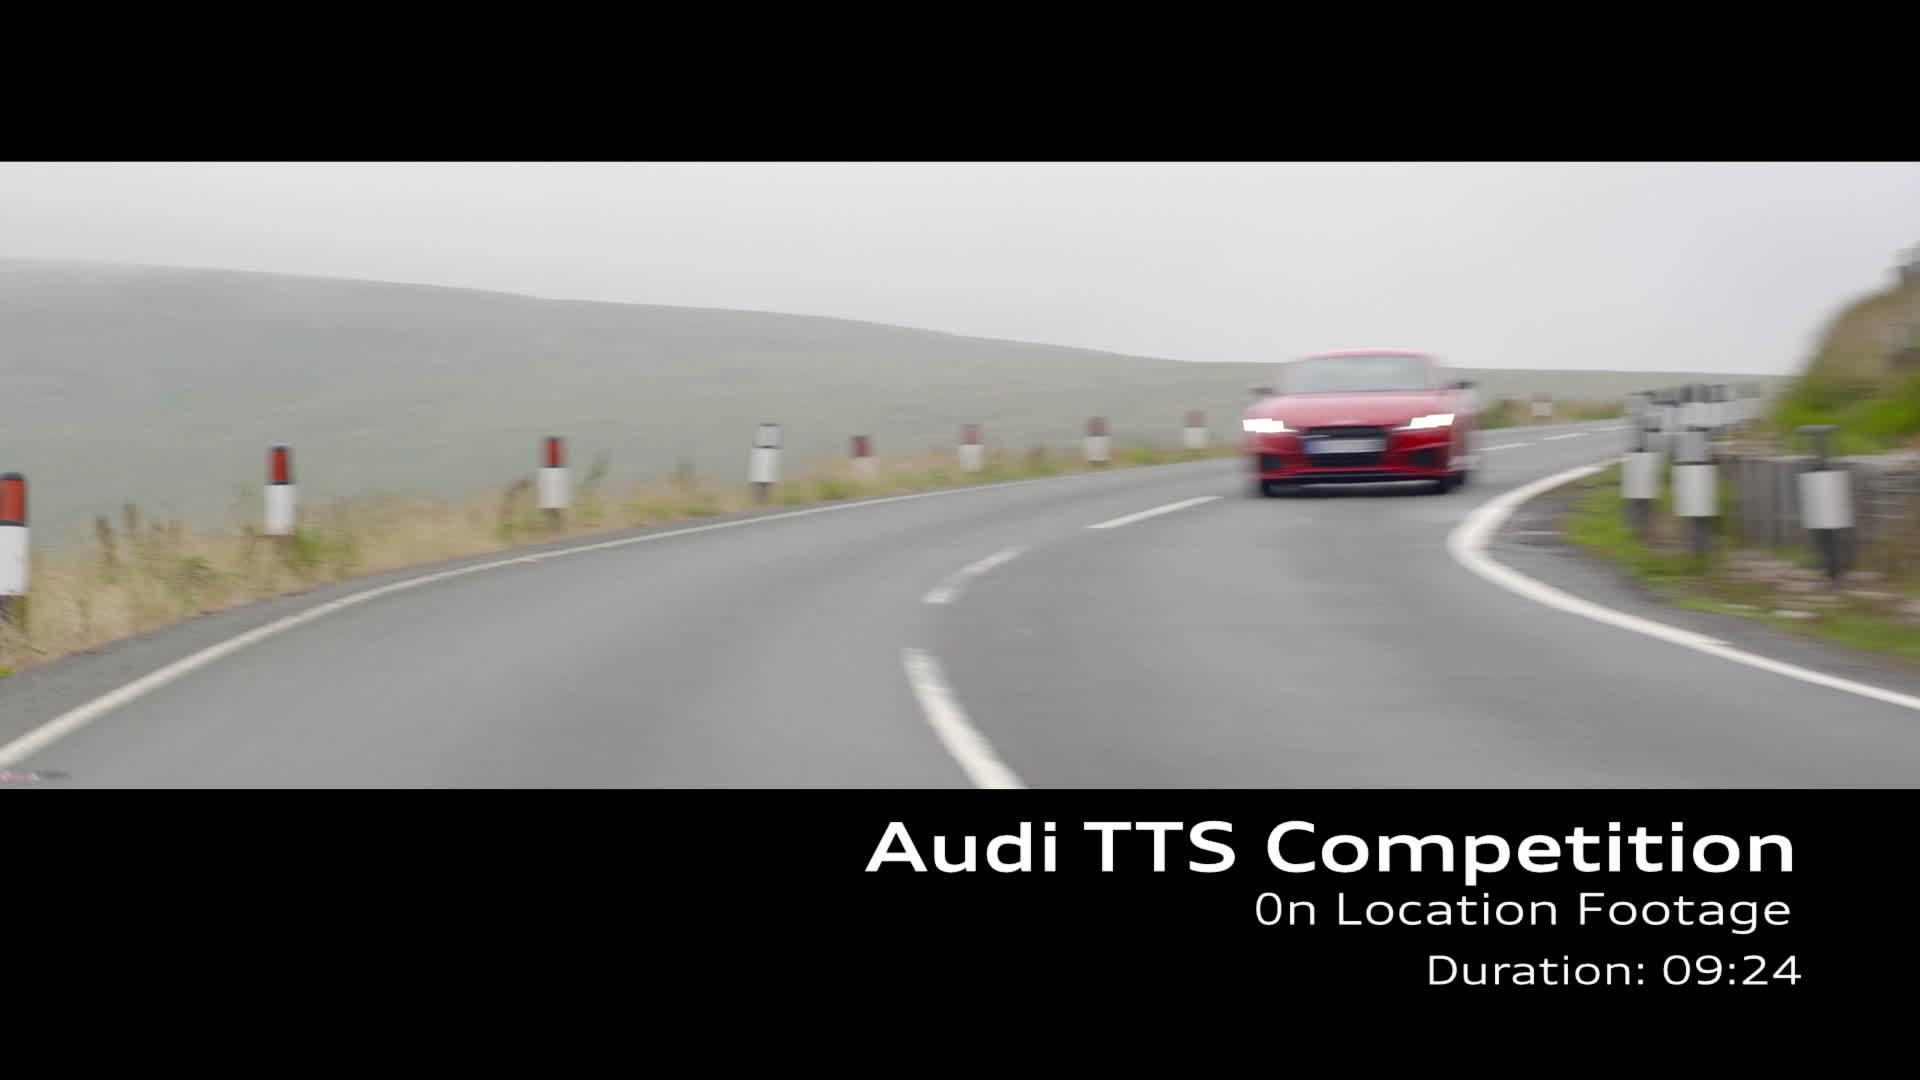 Audi TTS Footage Tangorot